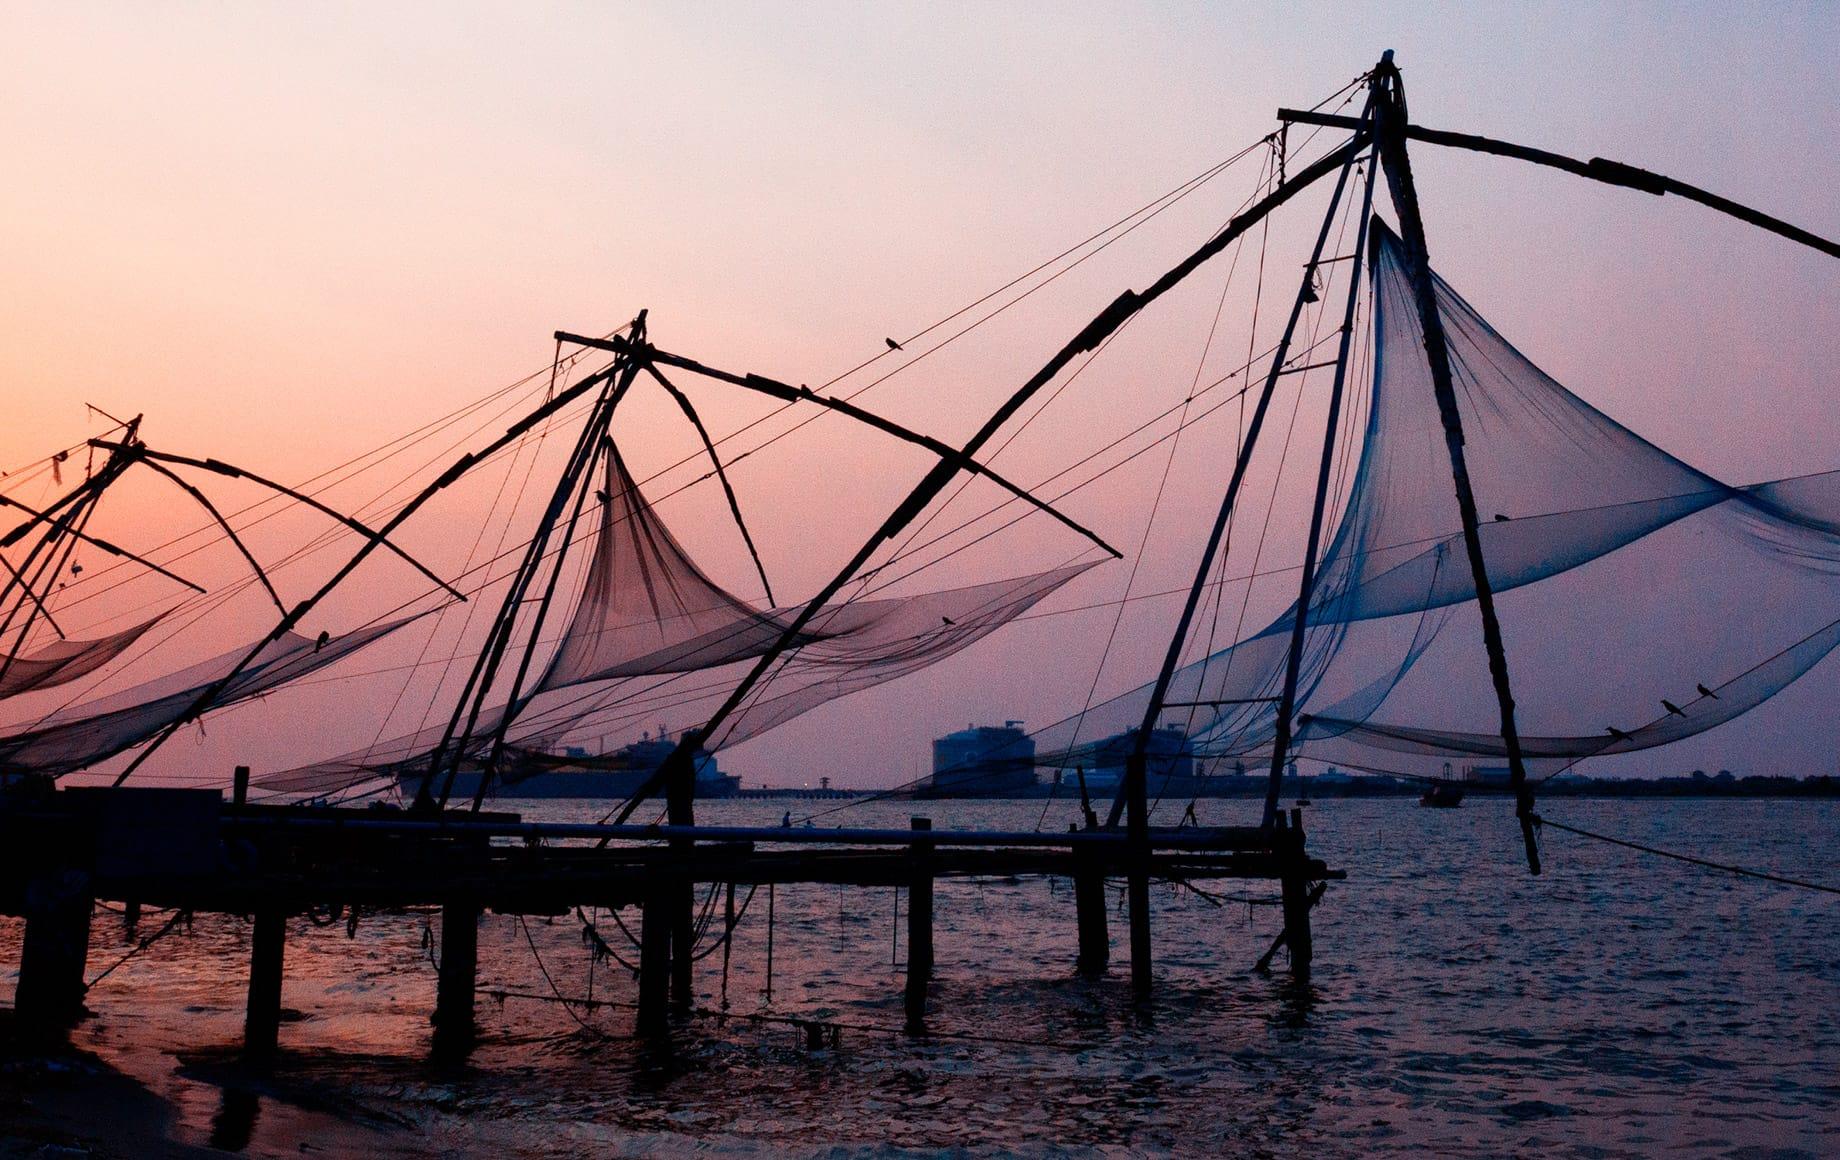 Kerala evening view